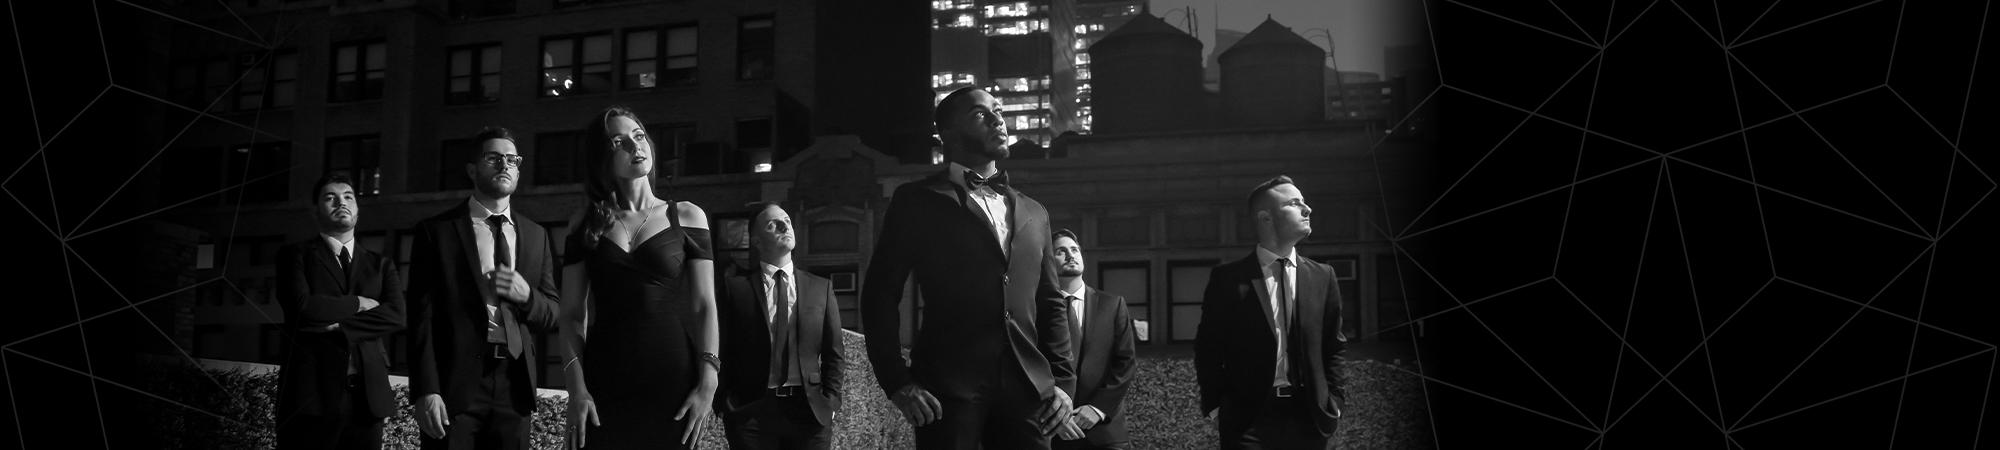 CityScape & The Park Avenue Horns | Elegant Music Group